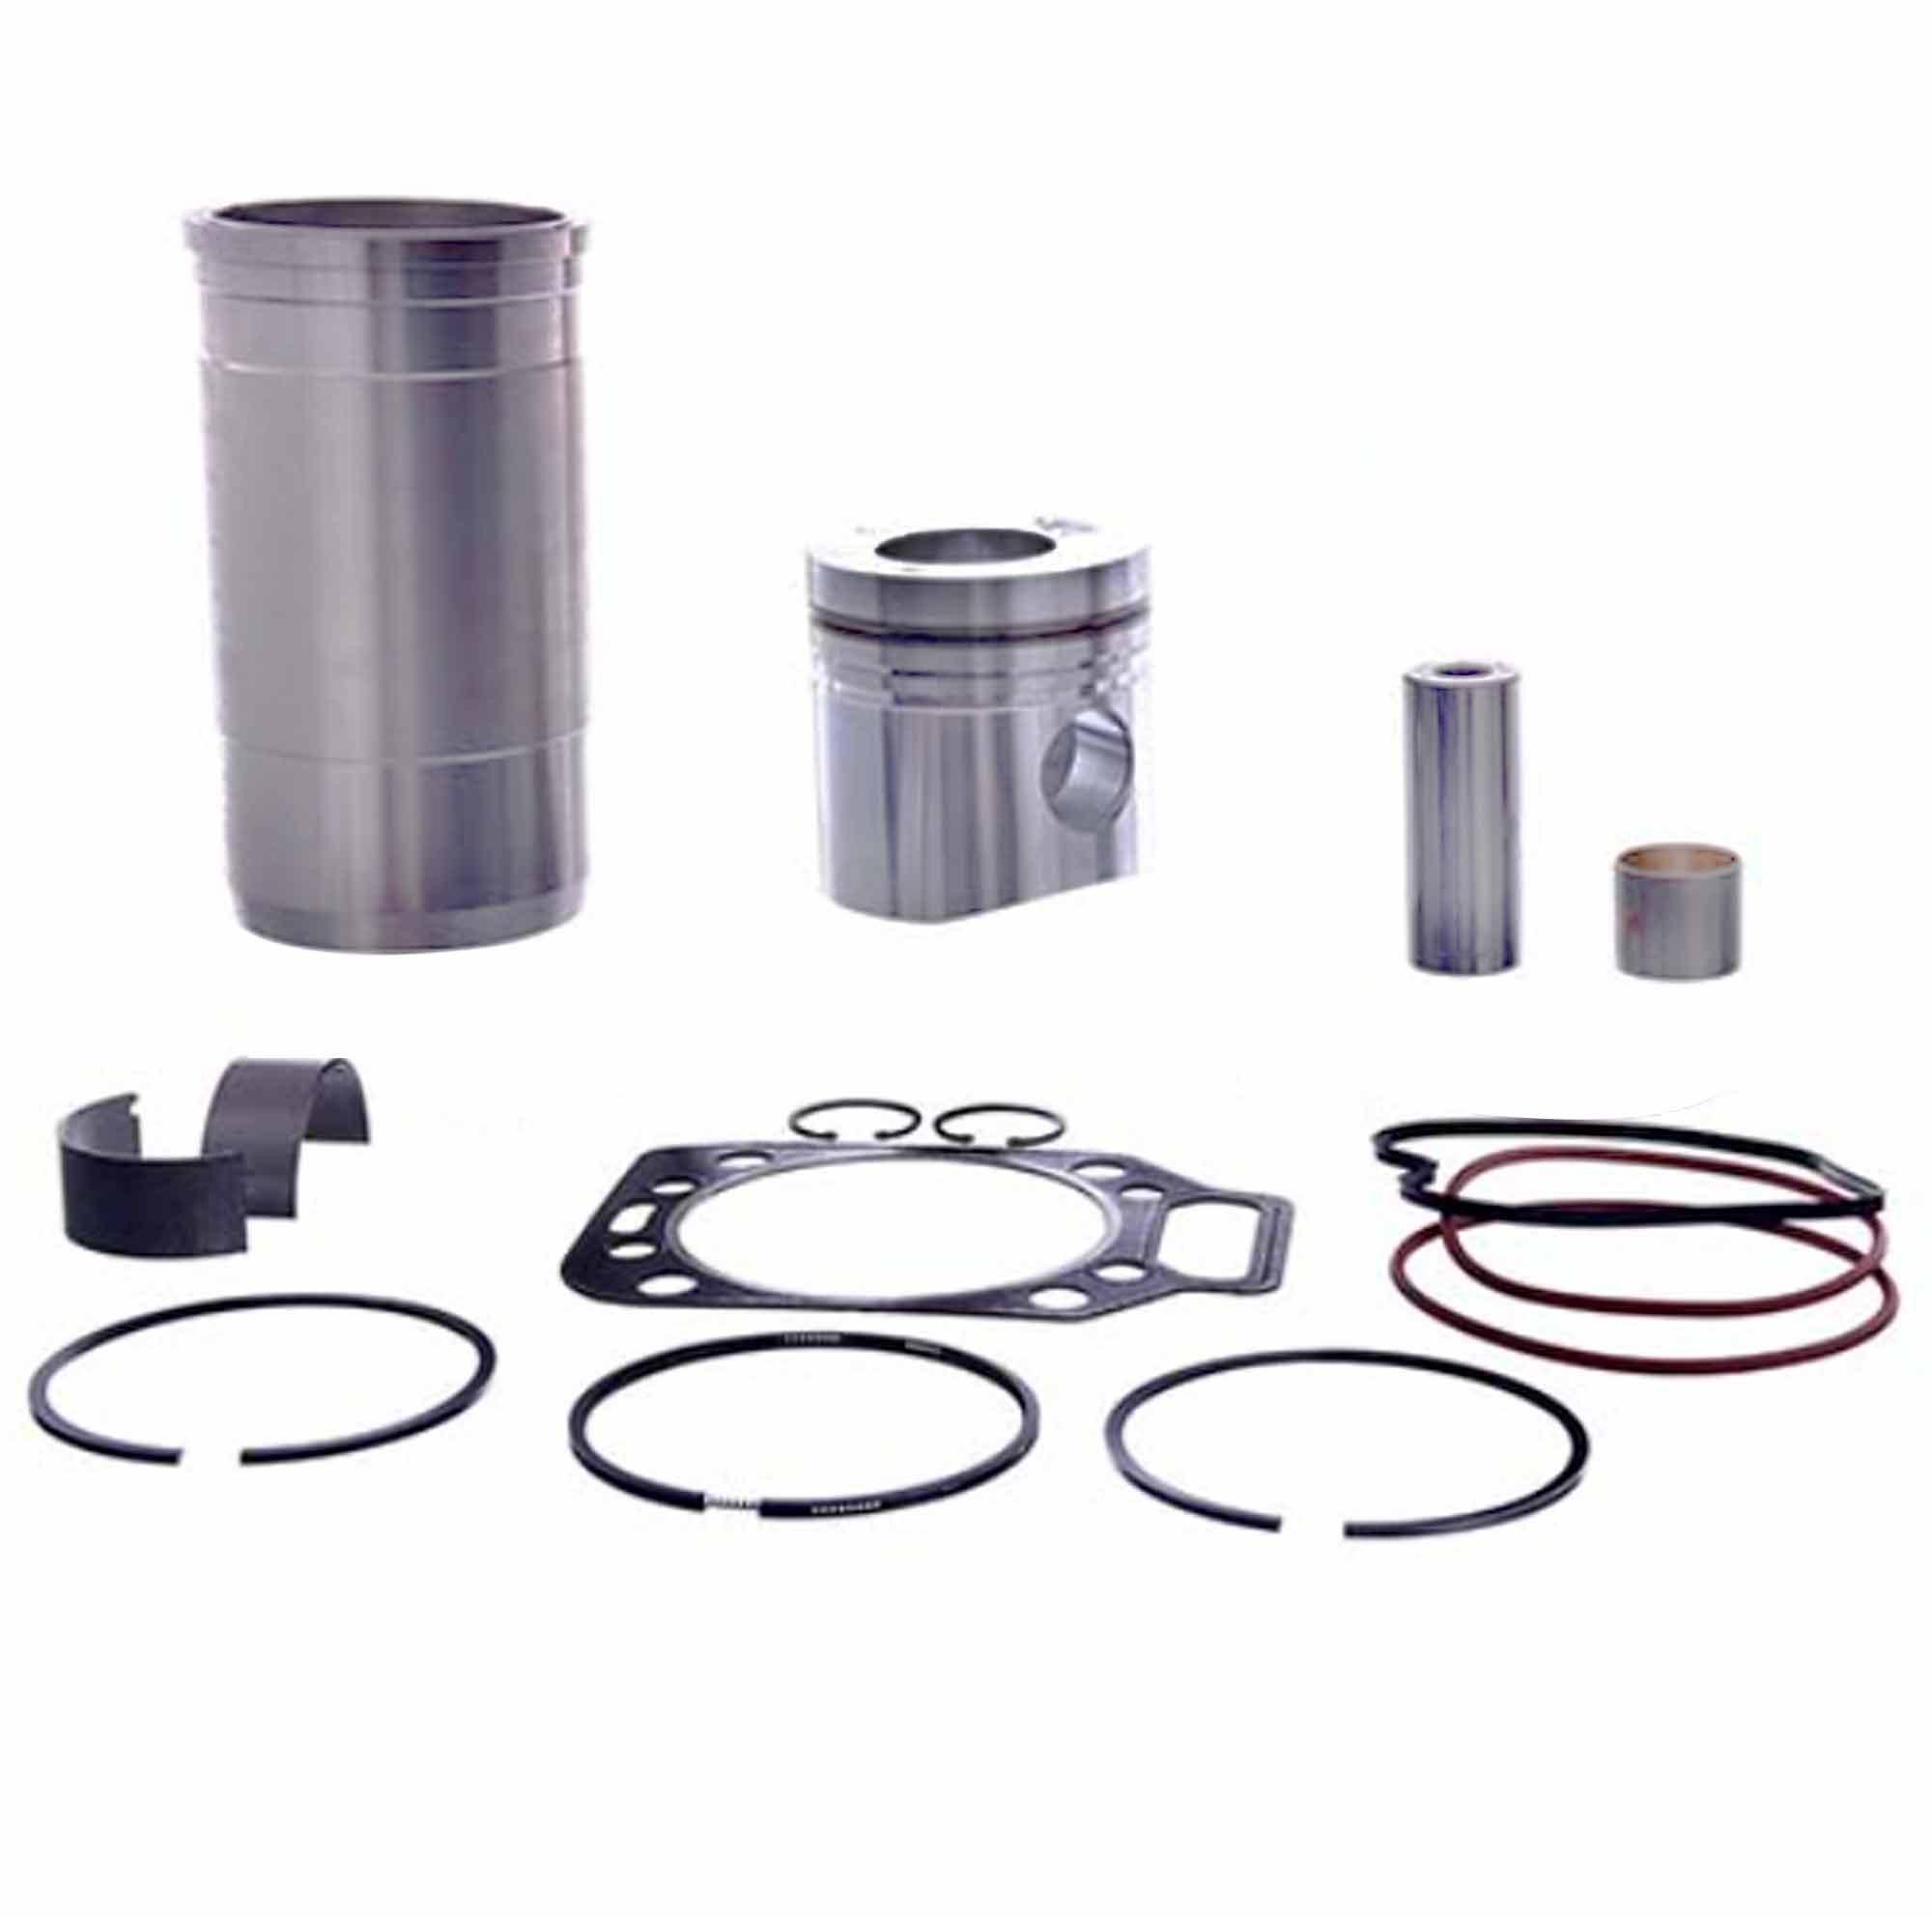 922980192998 - Kit de reparo para 1 cilindro - Super Master Kit